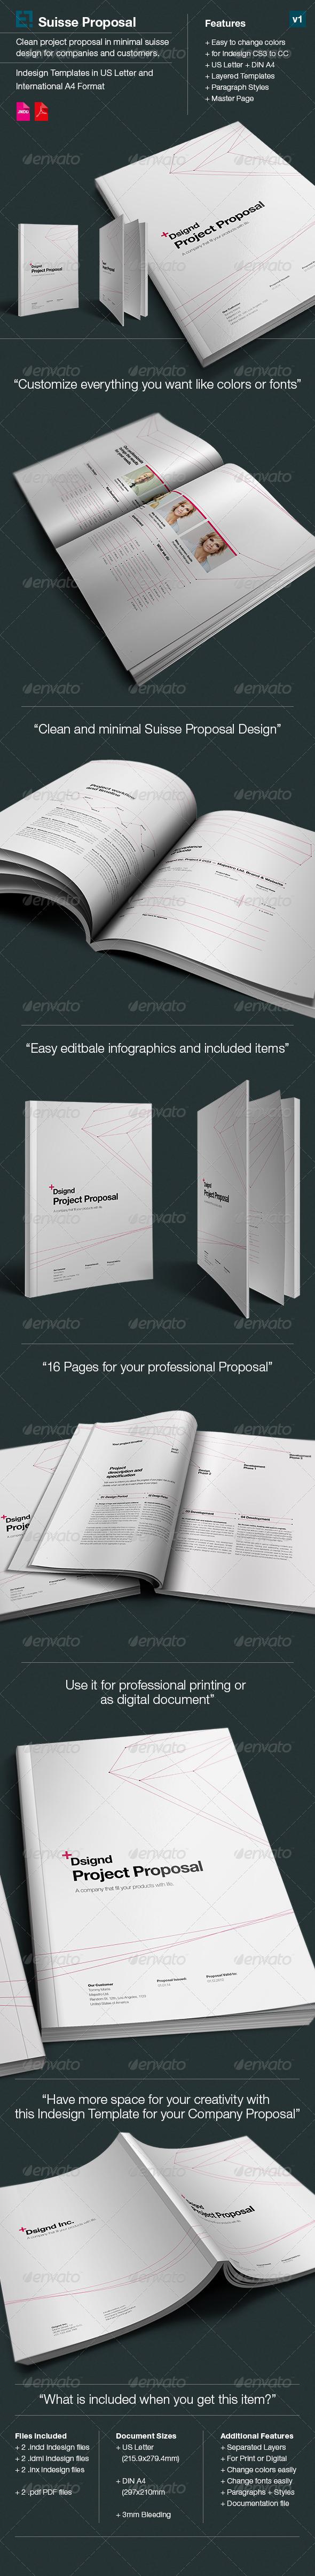 GraphicRiver Proposal Suisse Design Dsignd 6505125